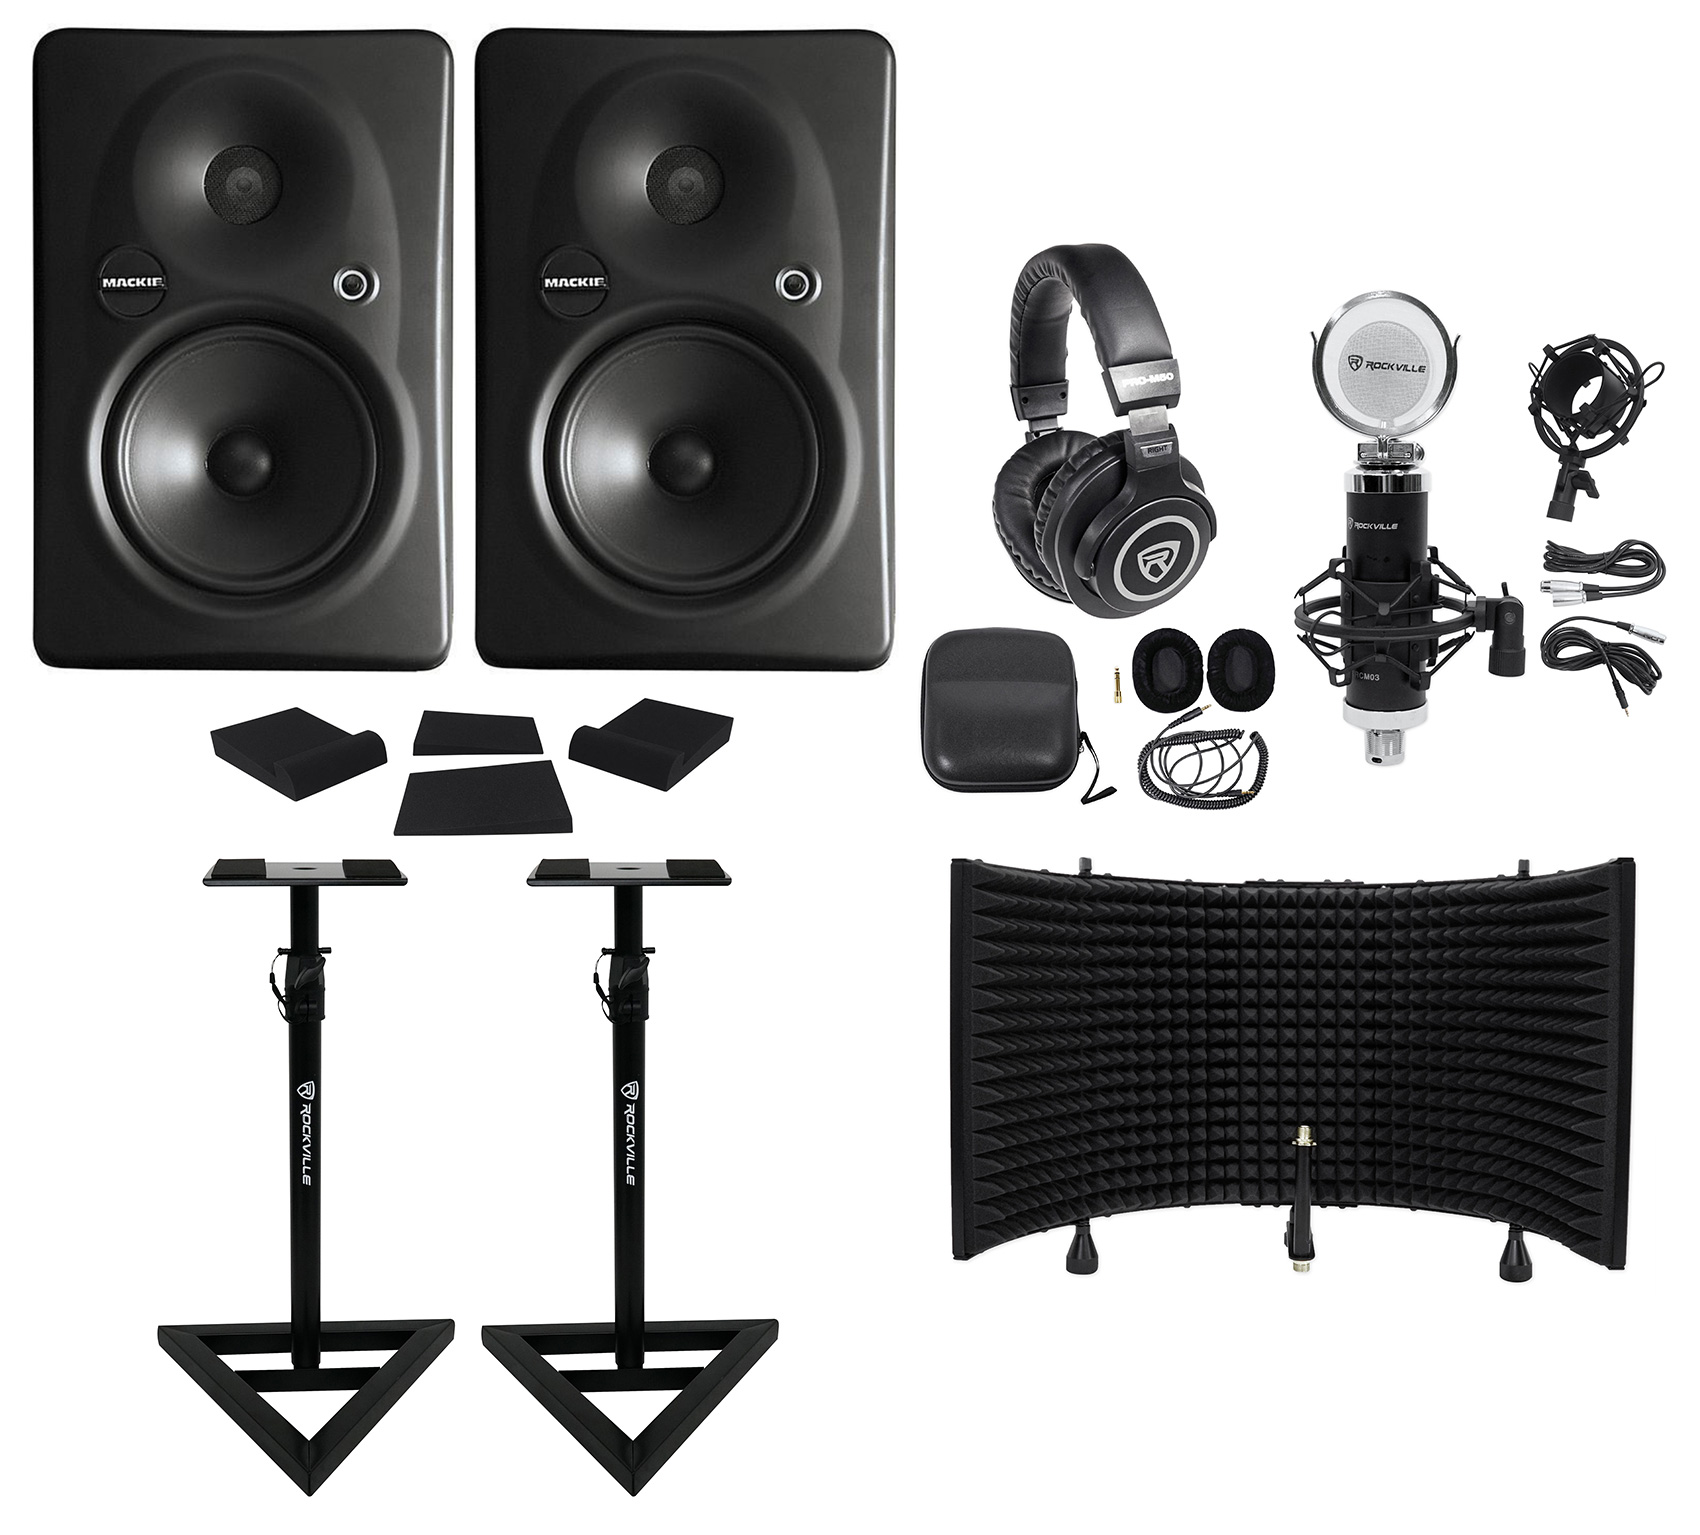 (2) Mackie HR624 MKII Powered Studio Monitors+Stands+Headphones+Mic+Shield+Pads by Mackie